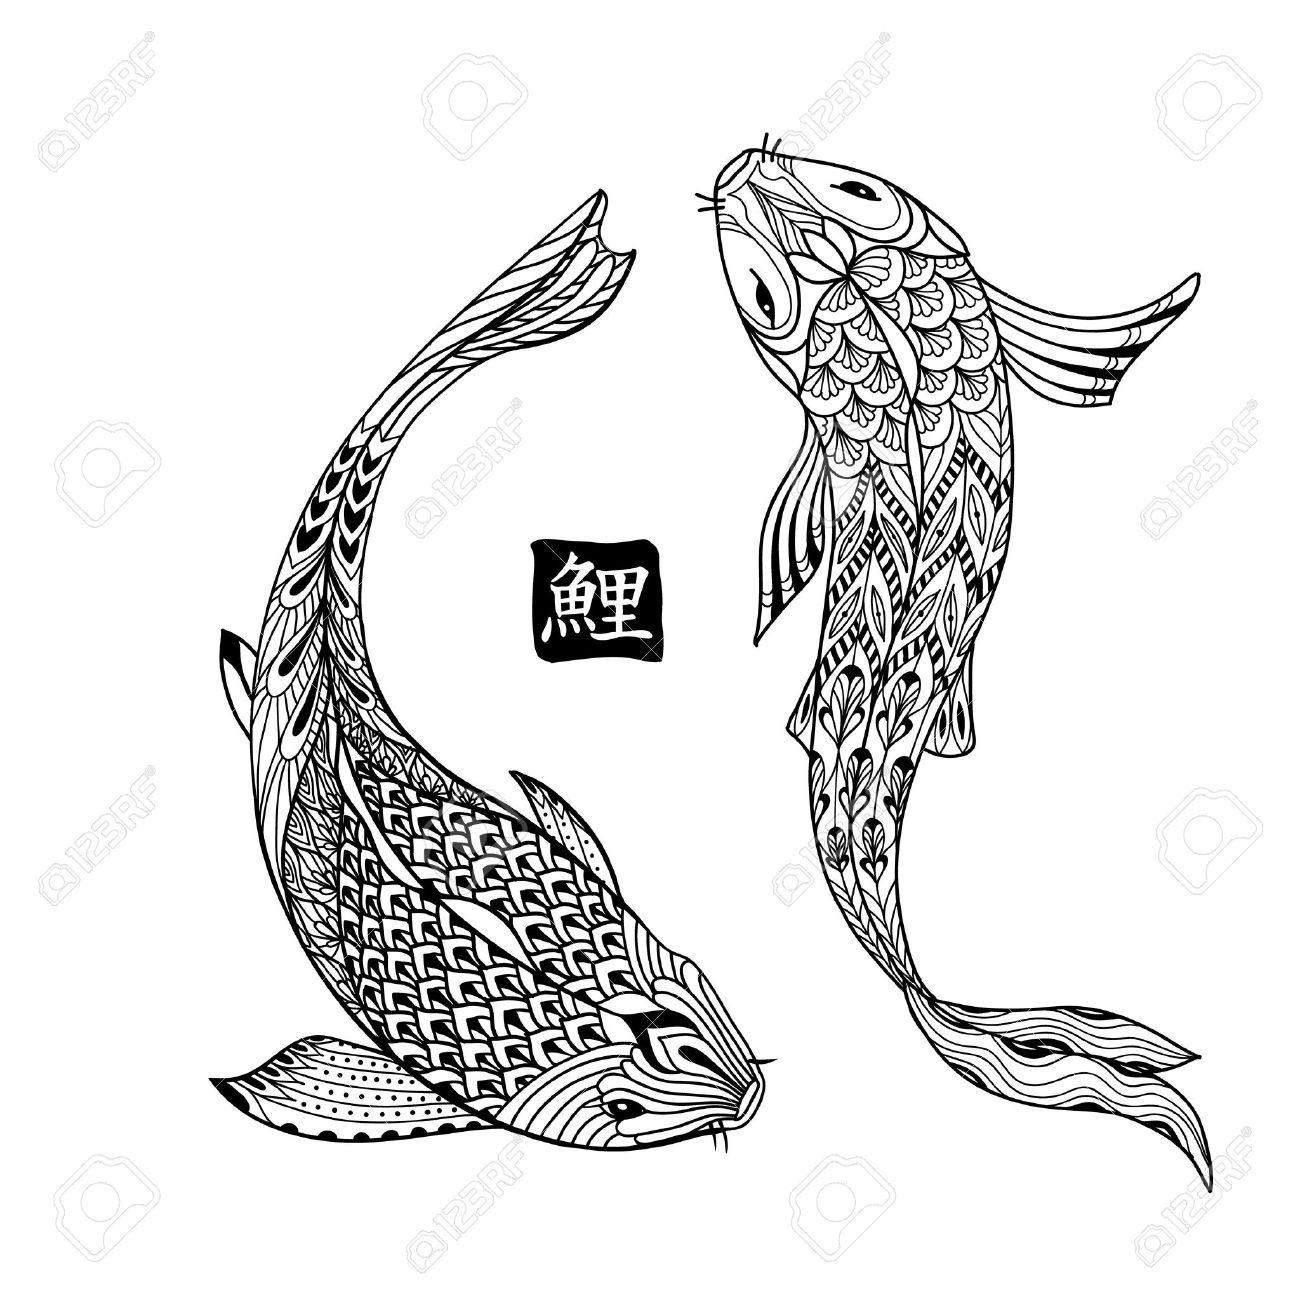 Hand Drawn Koi Fish. Japanese Carp Line Drawing For Coloring ...